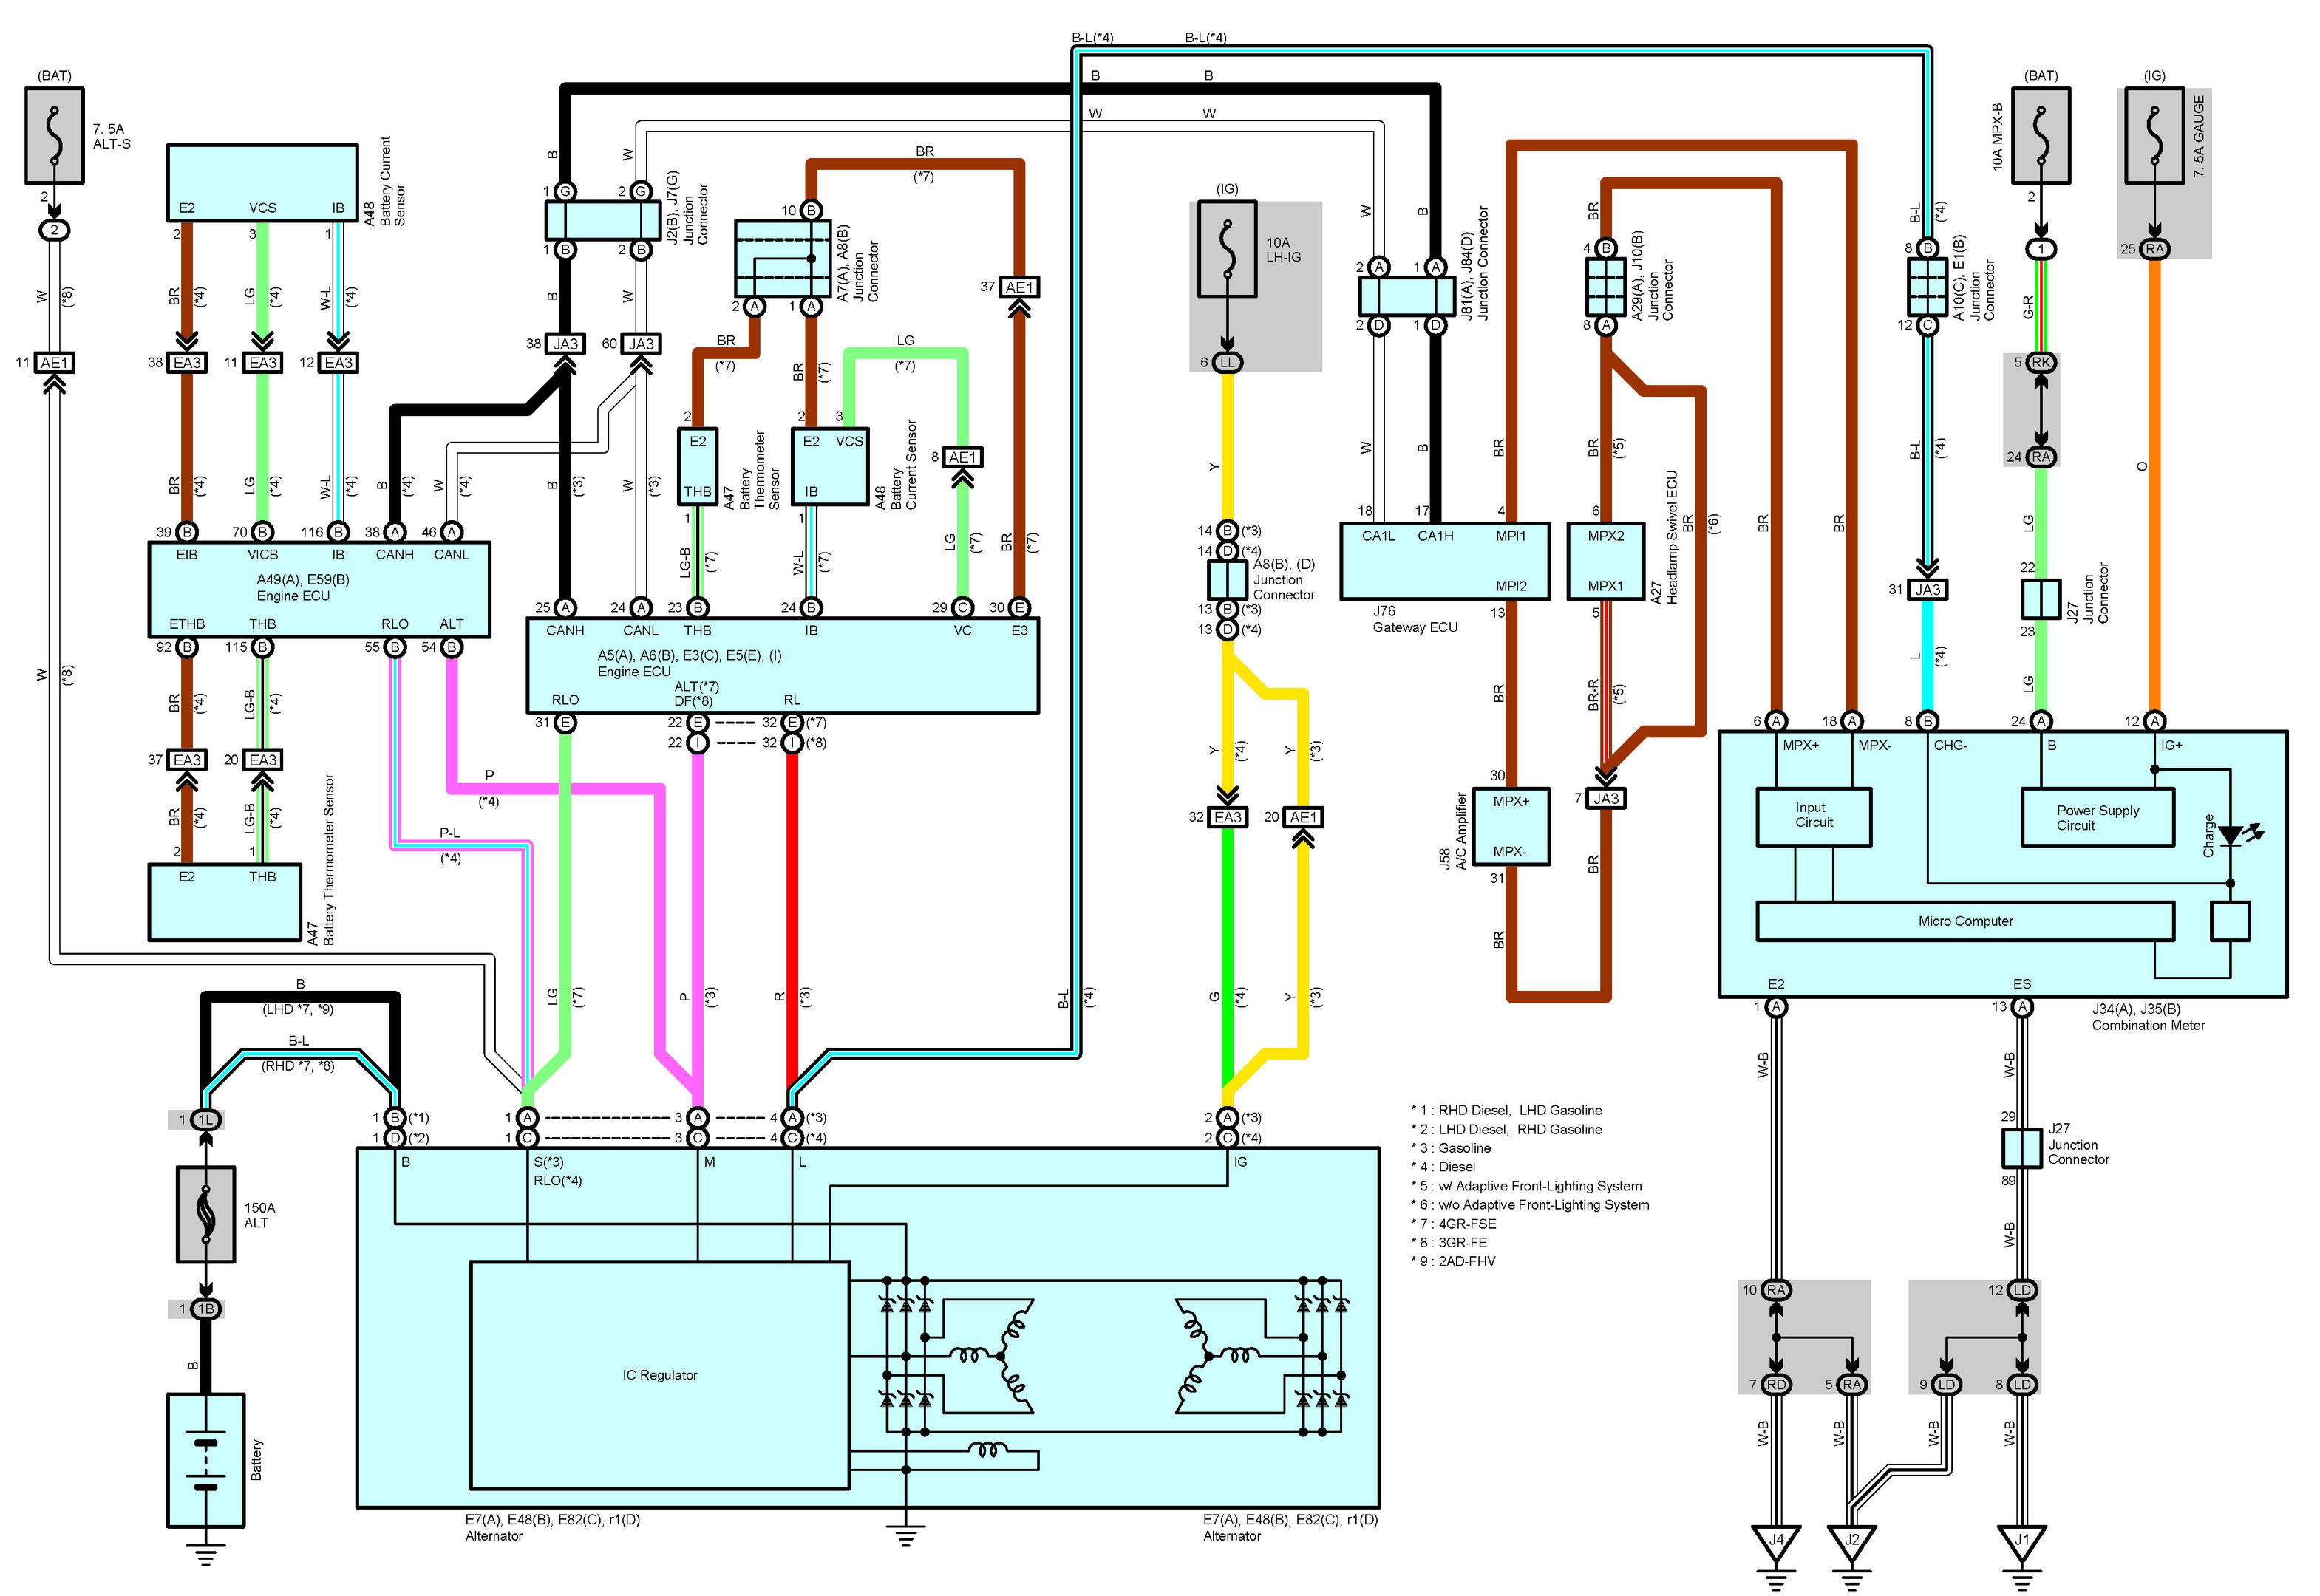 diagram lexus ac wiring diagram wiring file dm26388 1990 Lexus LS400 Wiring-Diagram